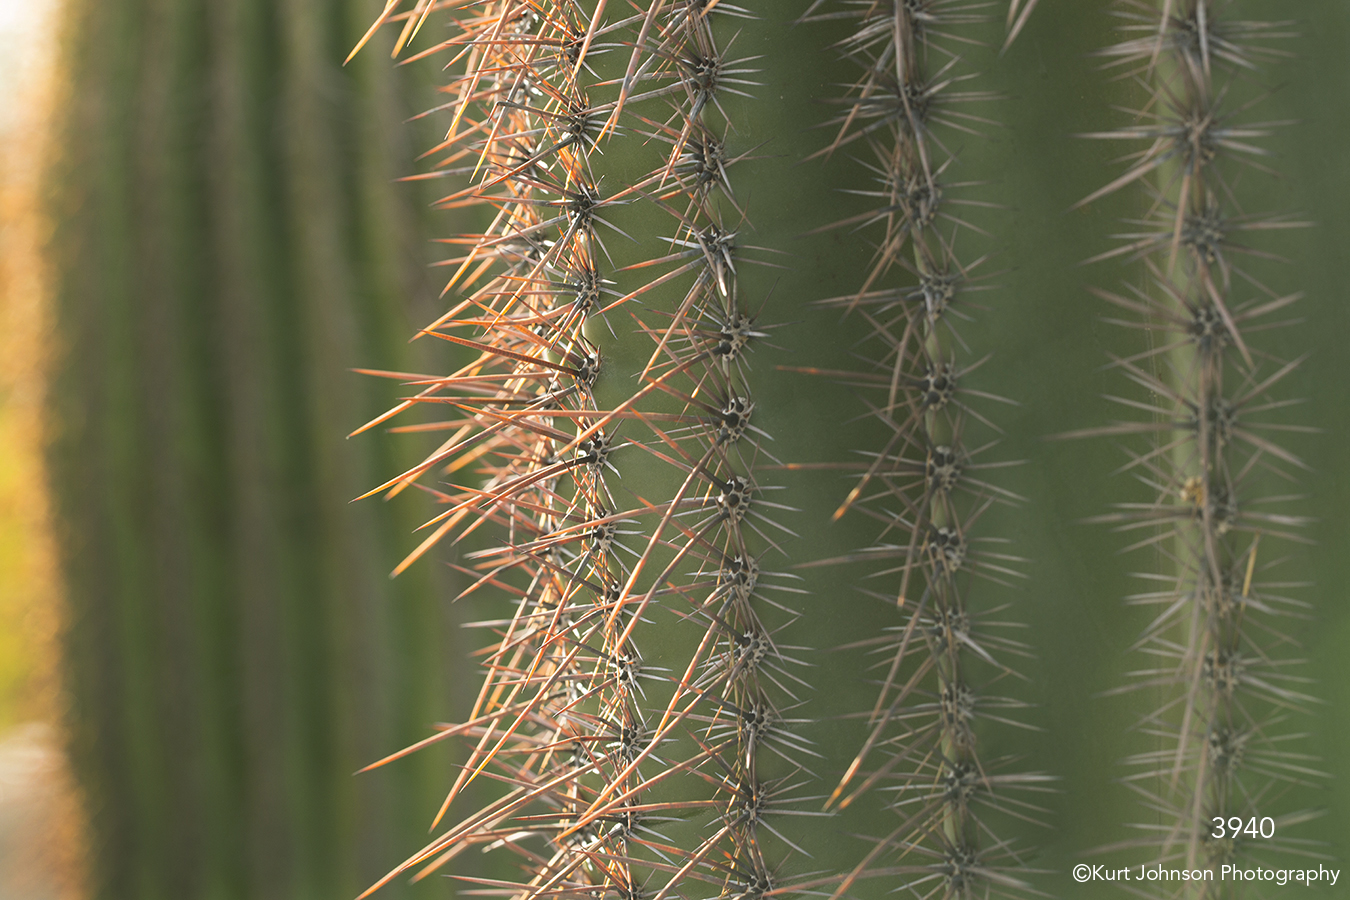 southwest cactus green texture